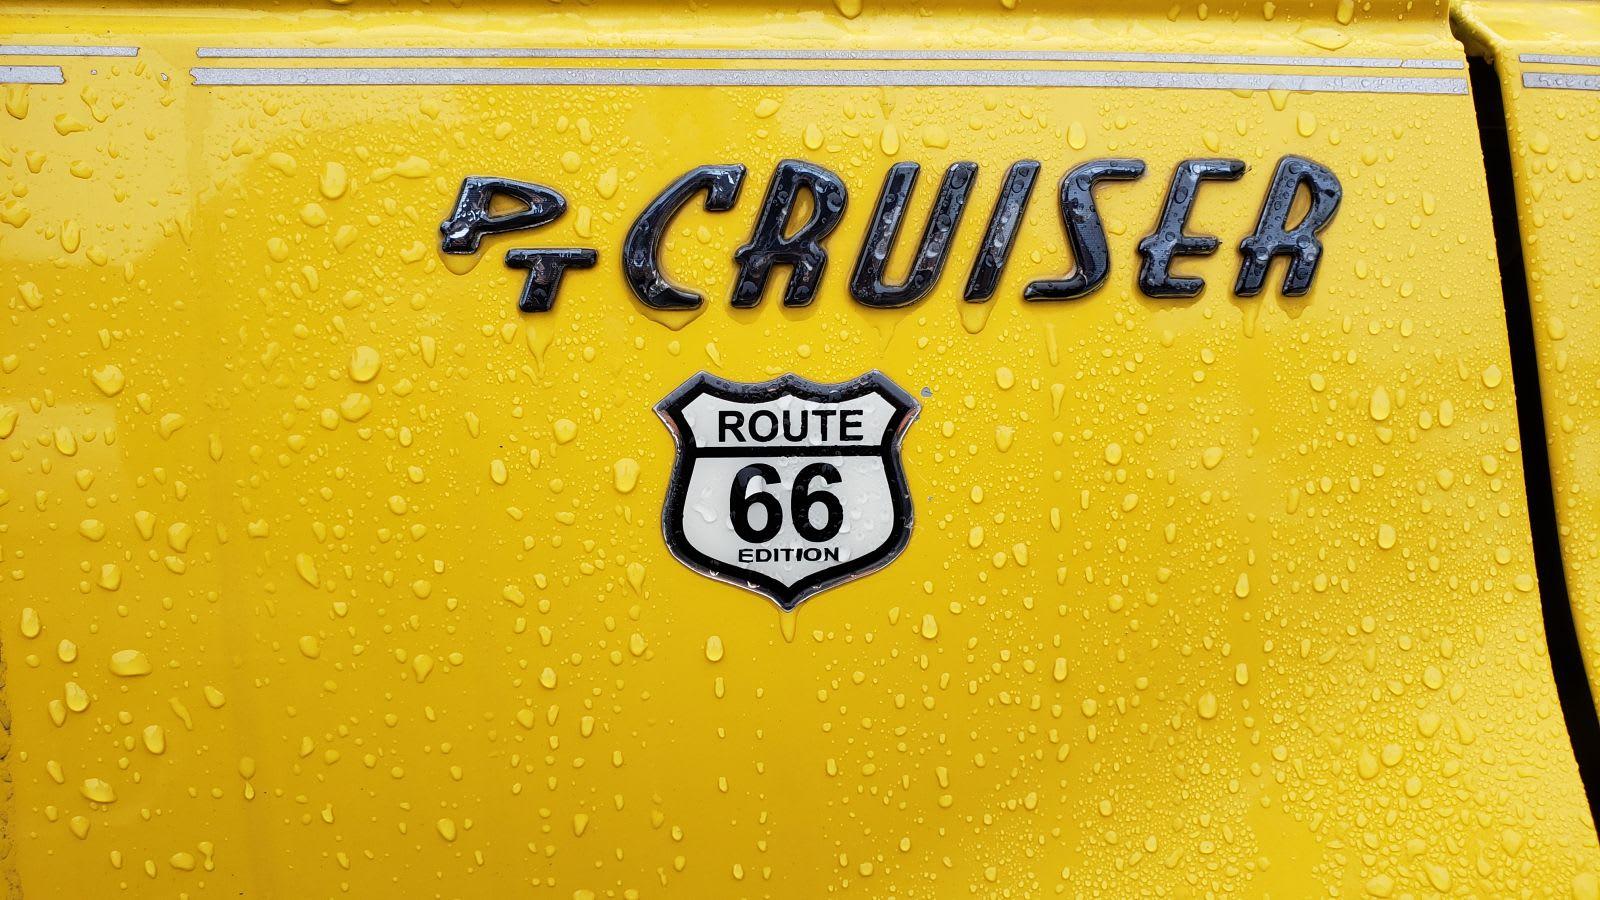 2006 Chrysler PT Cruiser Route 66 Edition in North Carolina wrecking yard